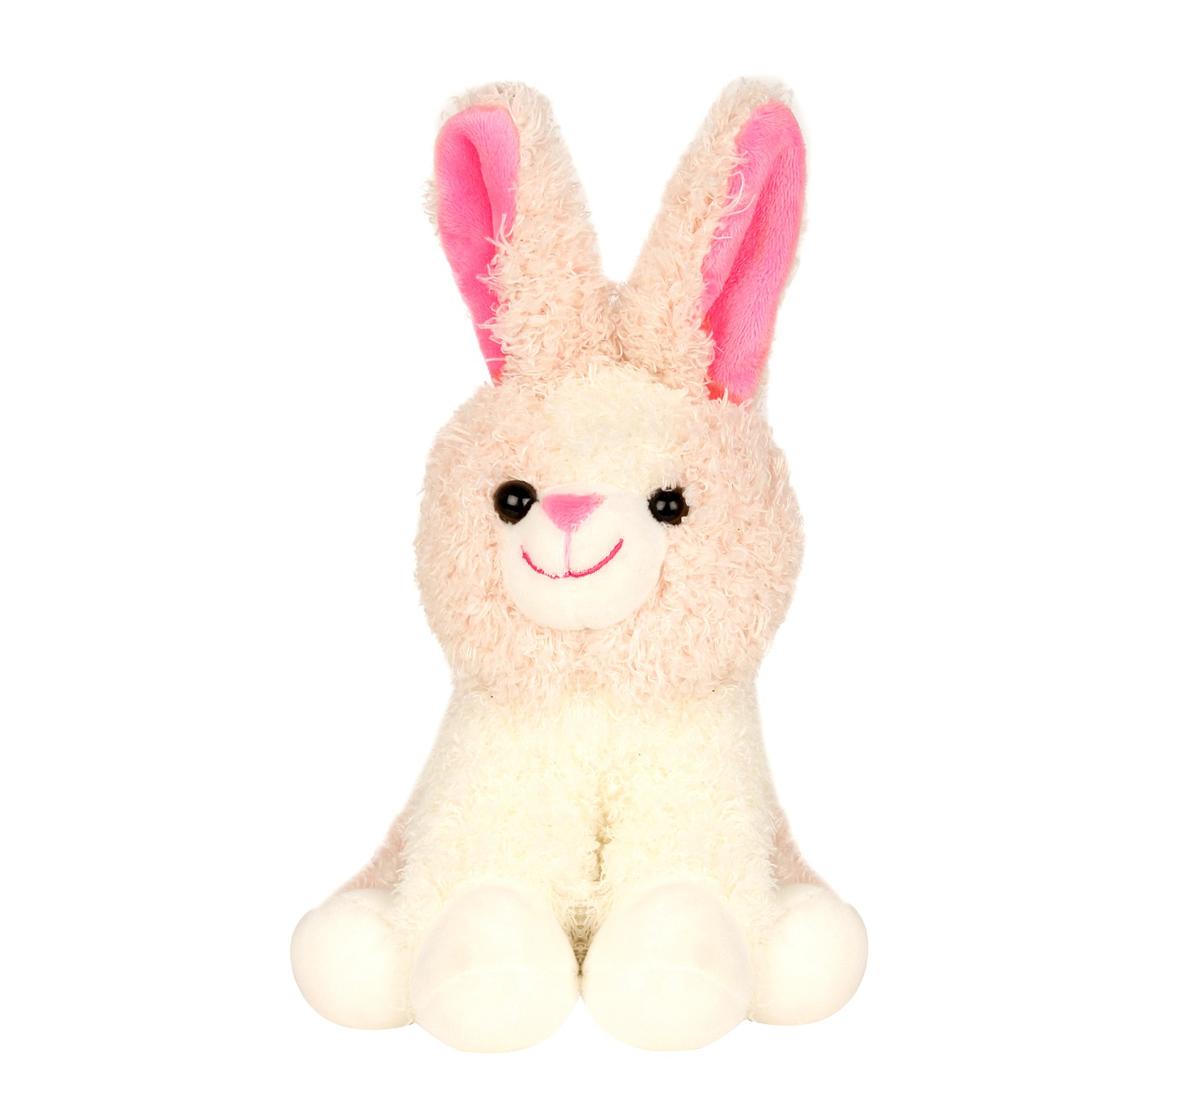 Sophie | Sophie Rabbit Plush , 17Cms Quirky Soft Toys for Kids age 12M+ - 17 Cm (Pink)